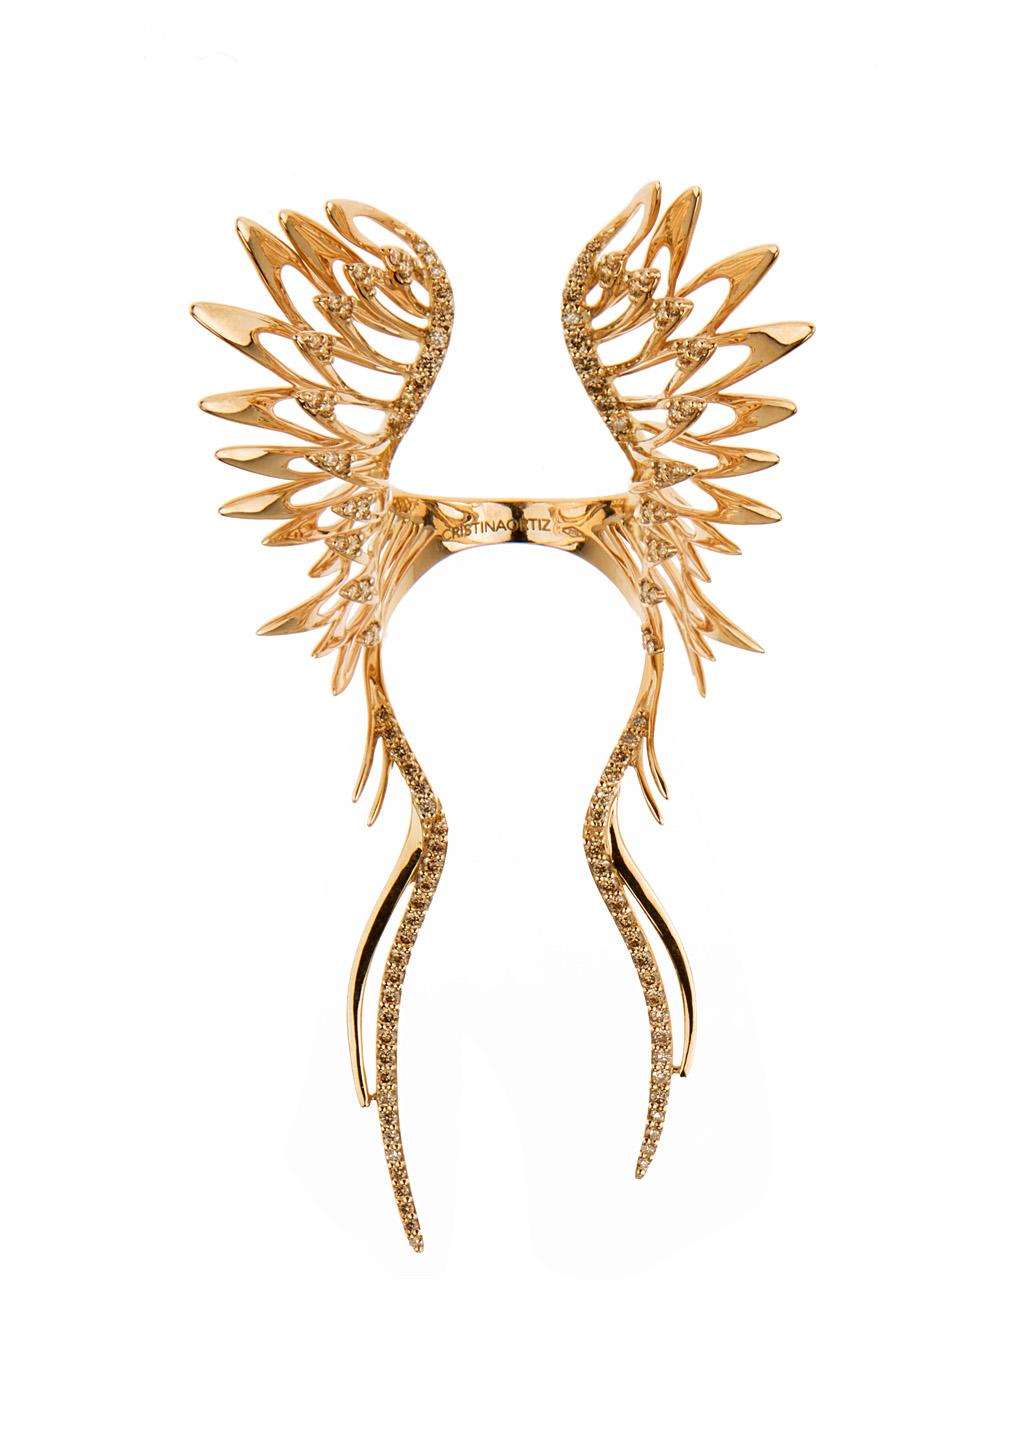 Cristina Ortiz Rings :: Cristina Ortiz pink gold and brown diamonds Wings ring | Montaigne Market